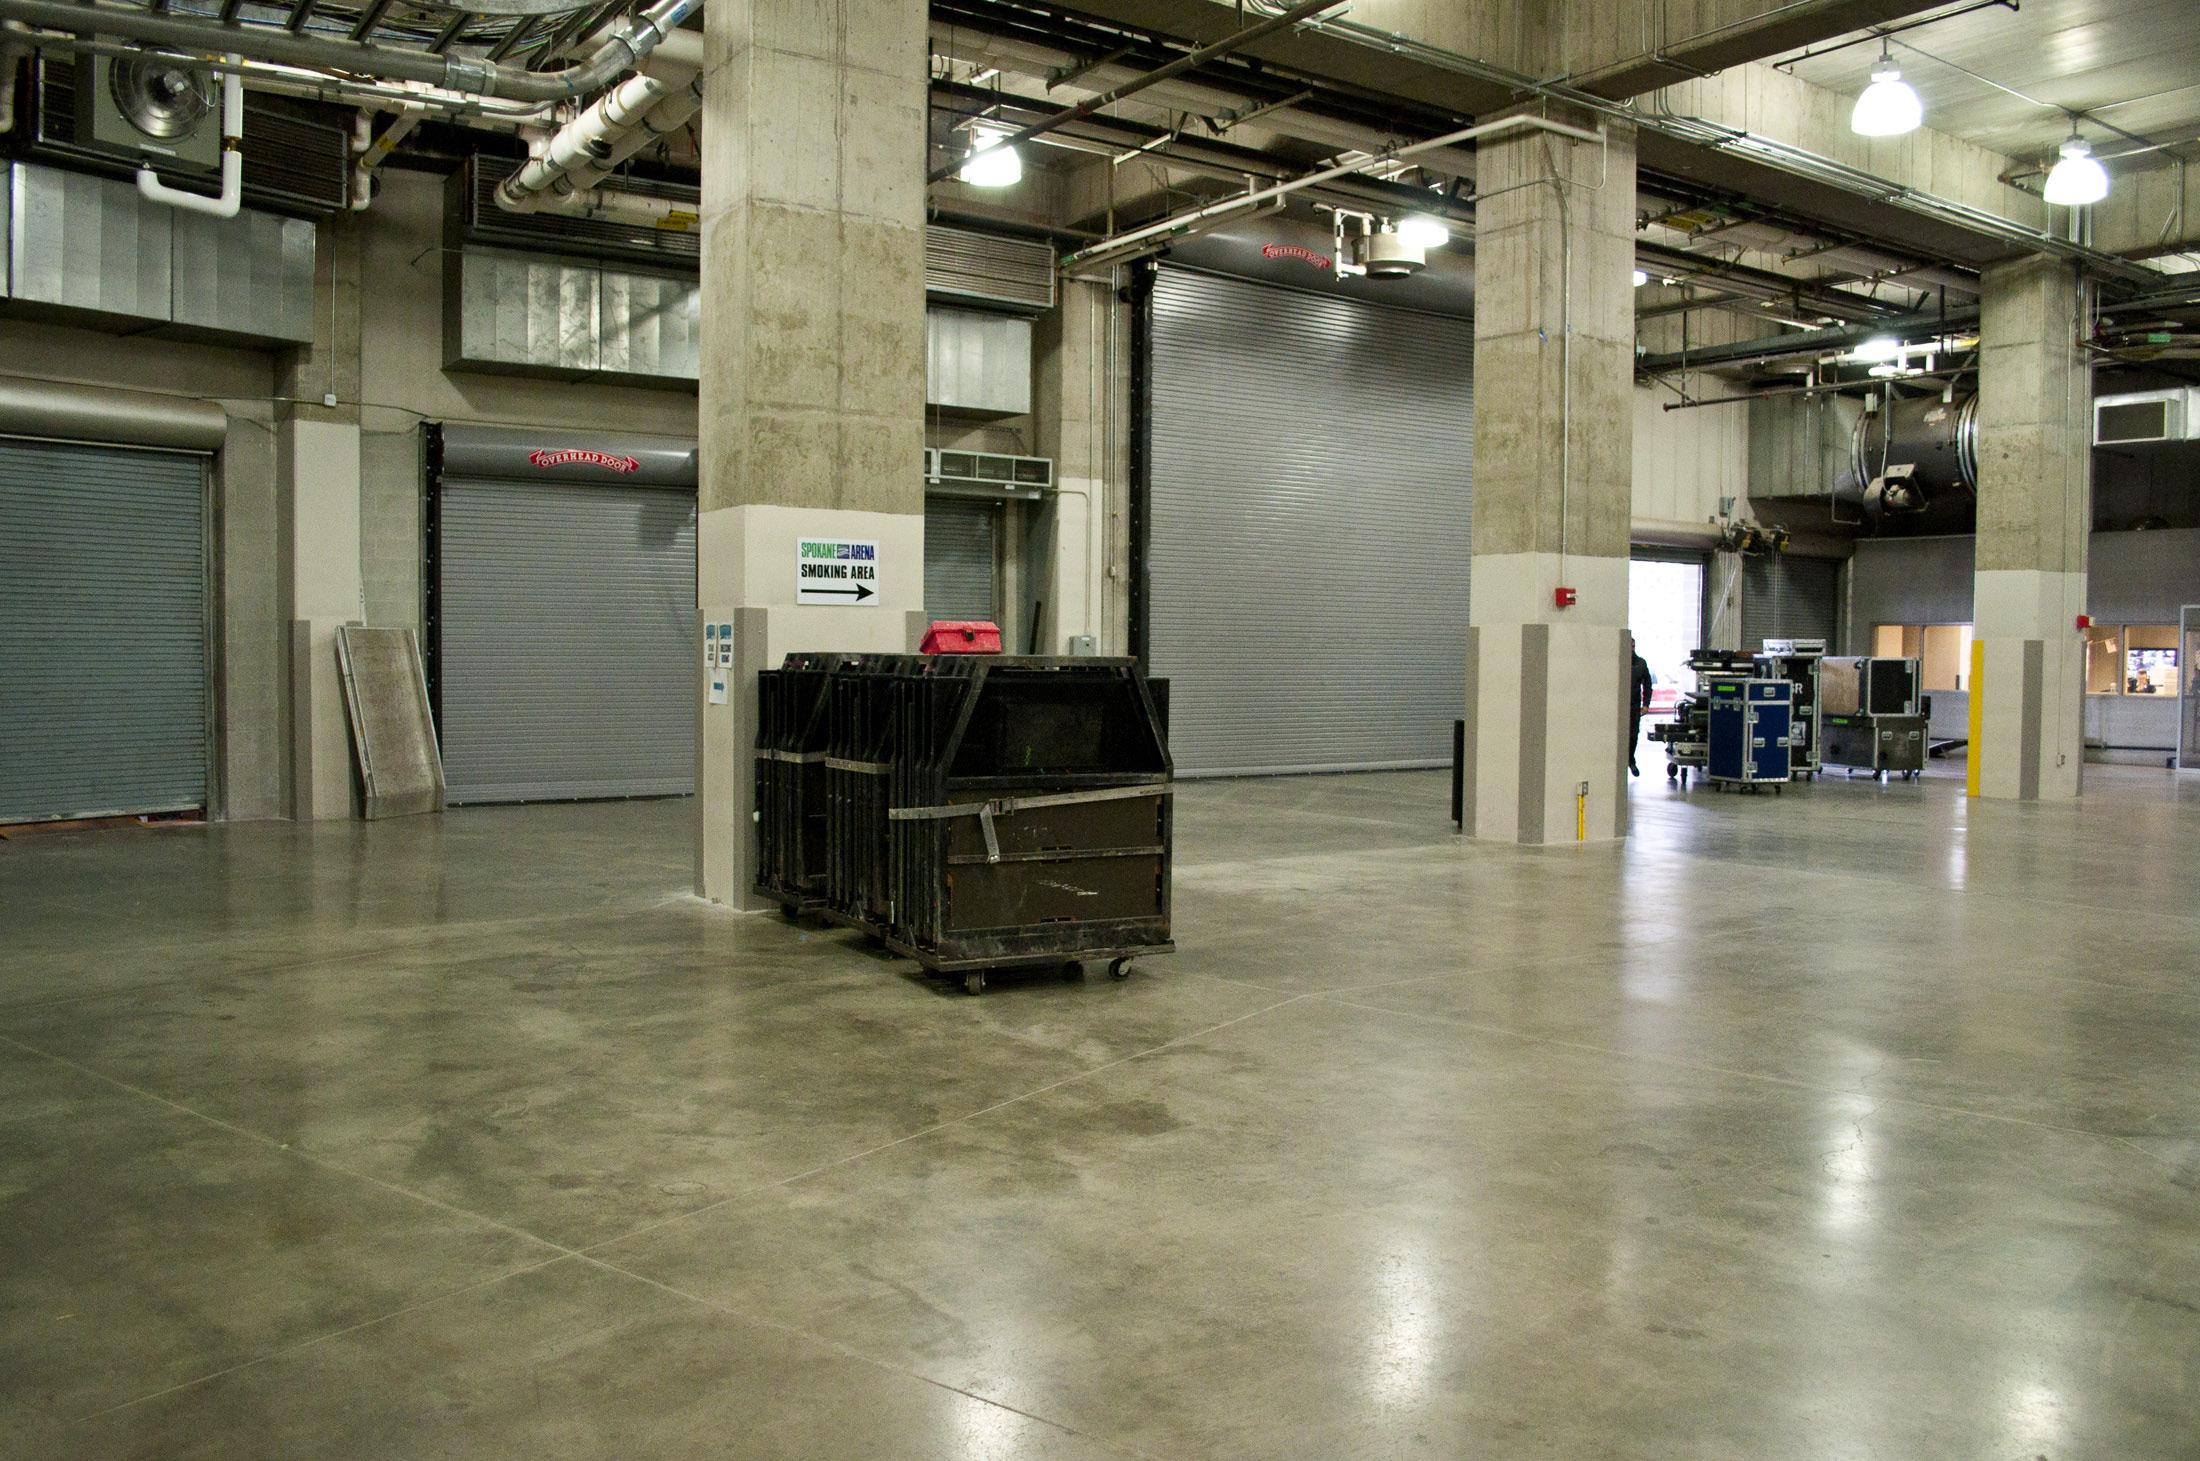 Spokane Arena Facility Information